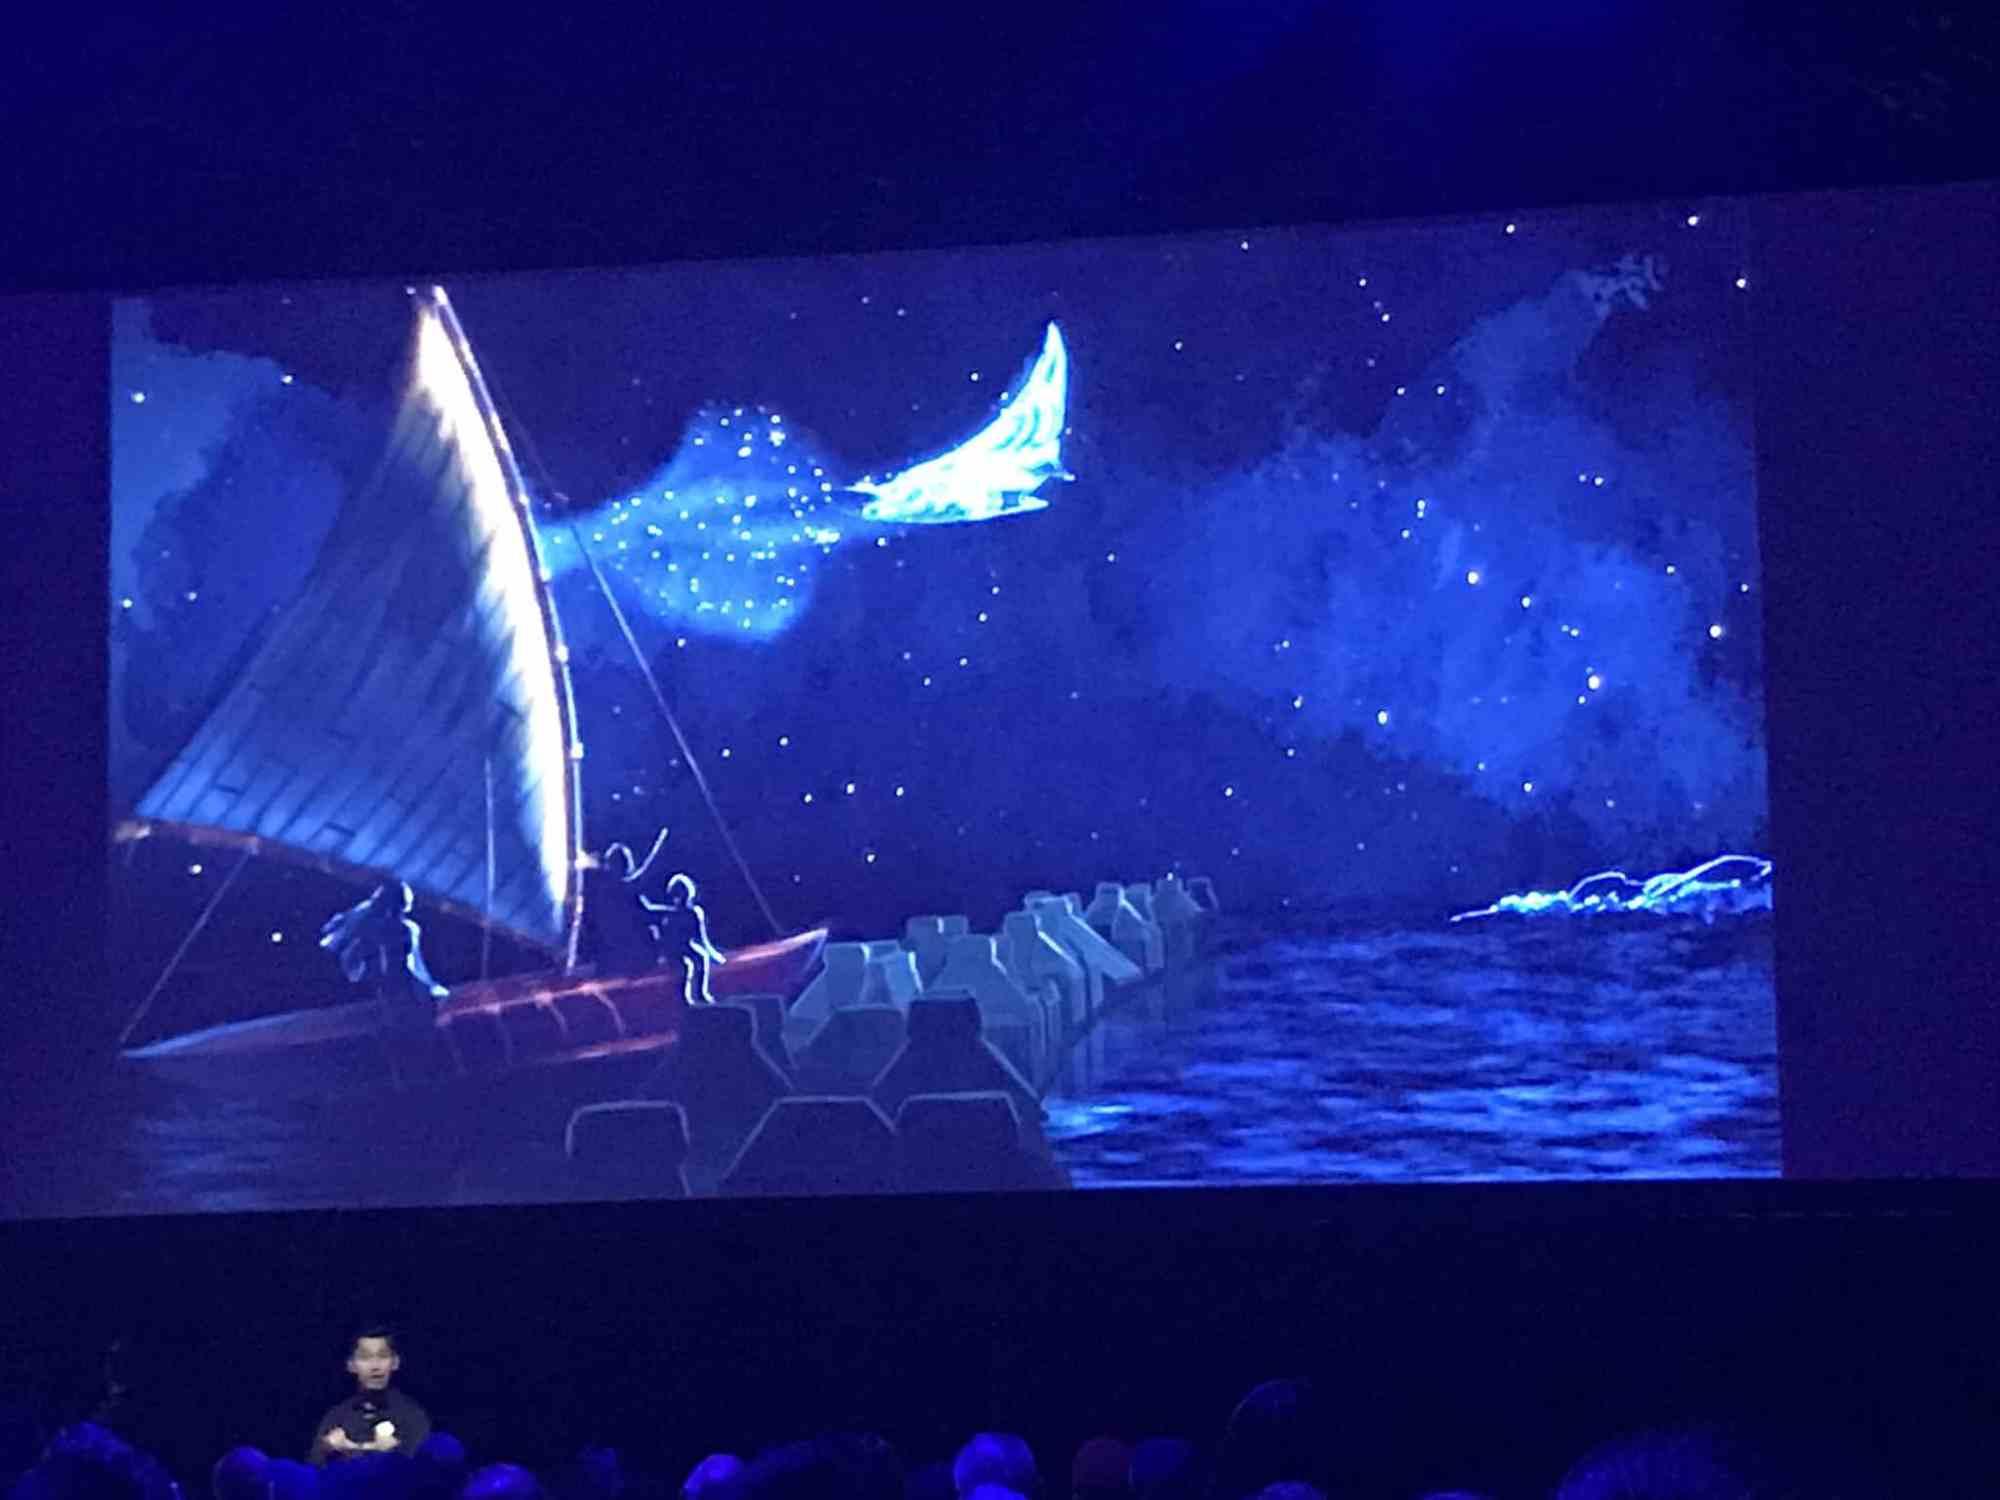 Spaceship Earth Updates